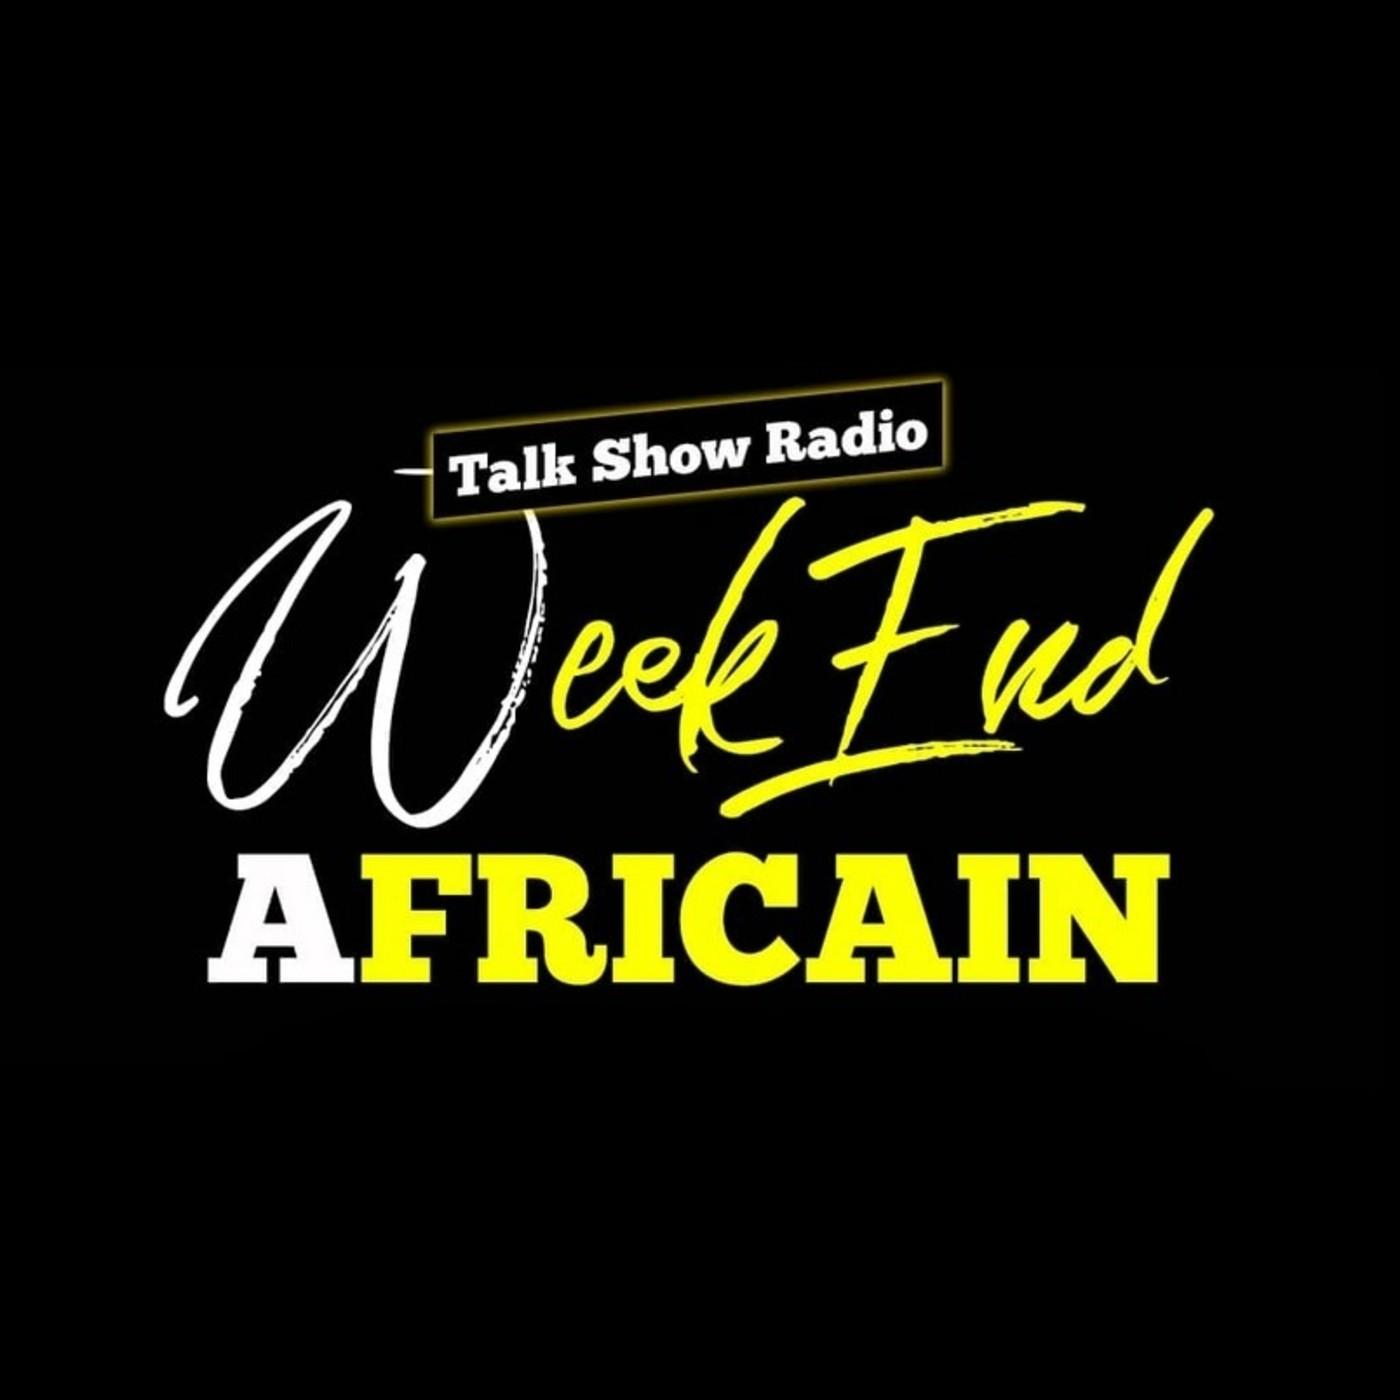 Weekend Africain